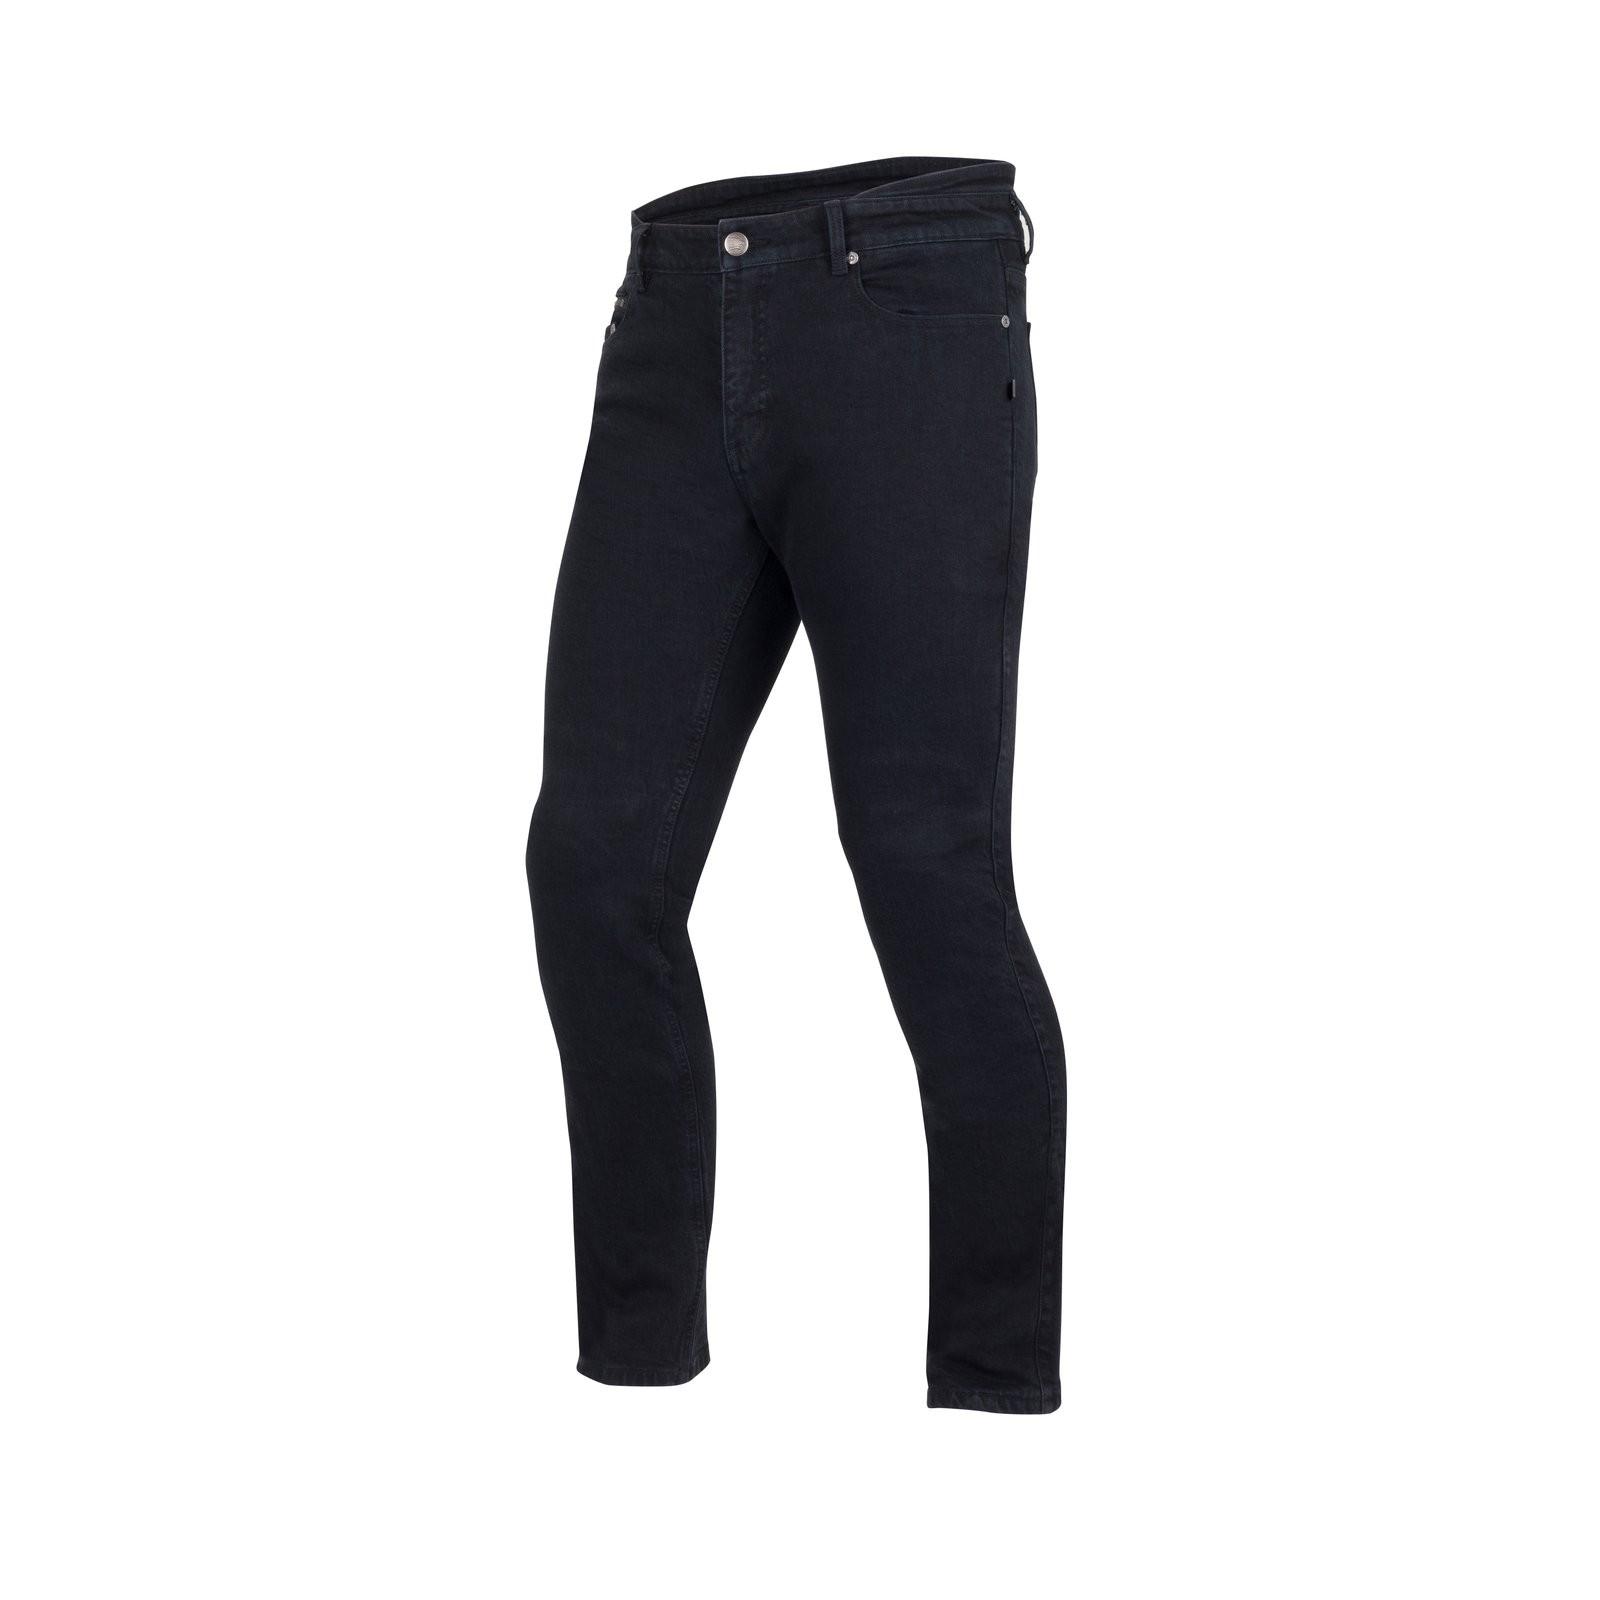 Pantalon MARLOW Noir / BTP550